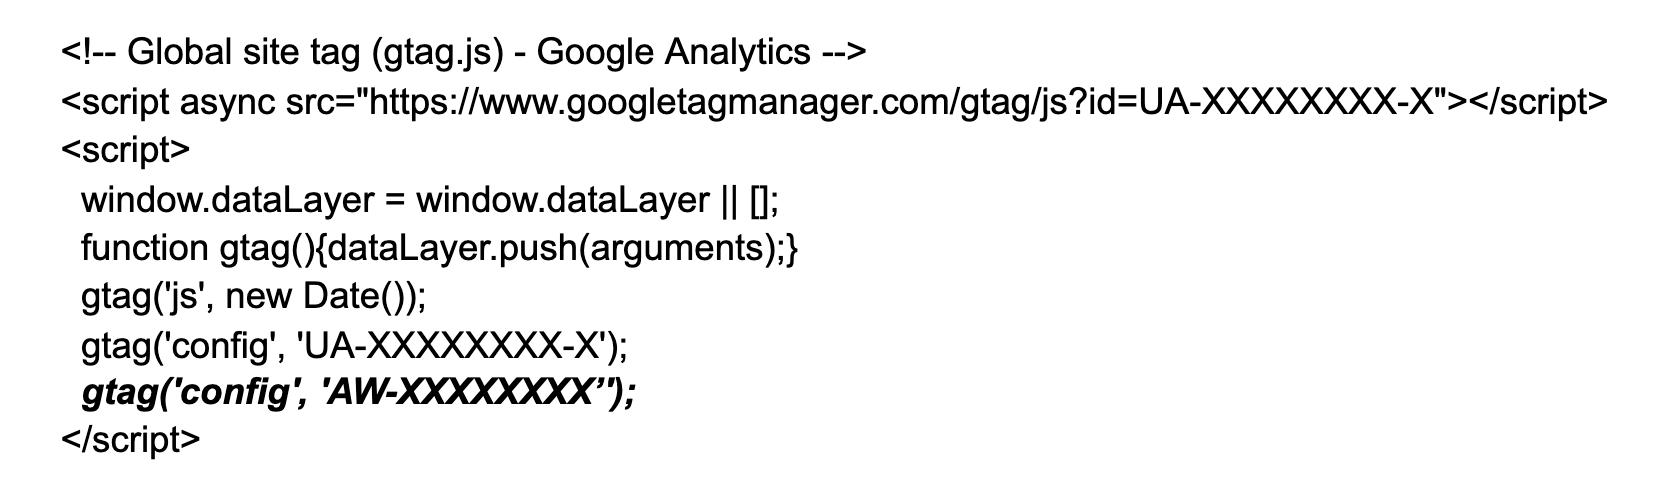 Google Ads Code in Google Analytics